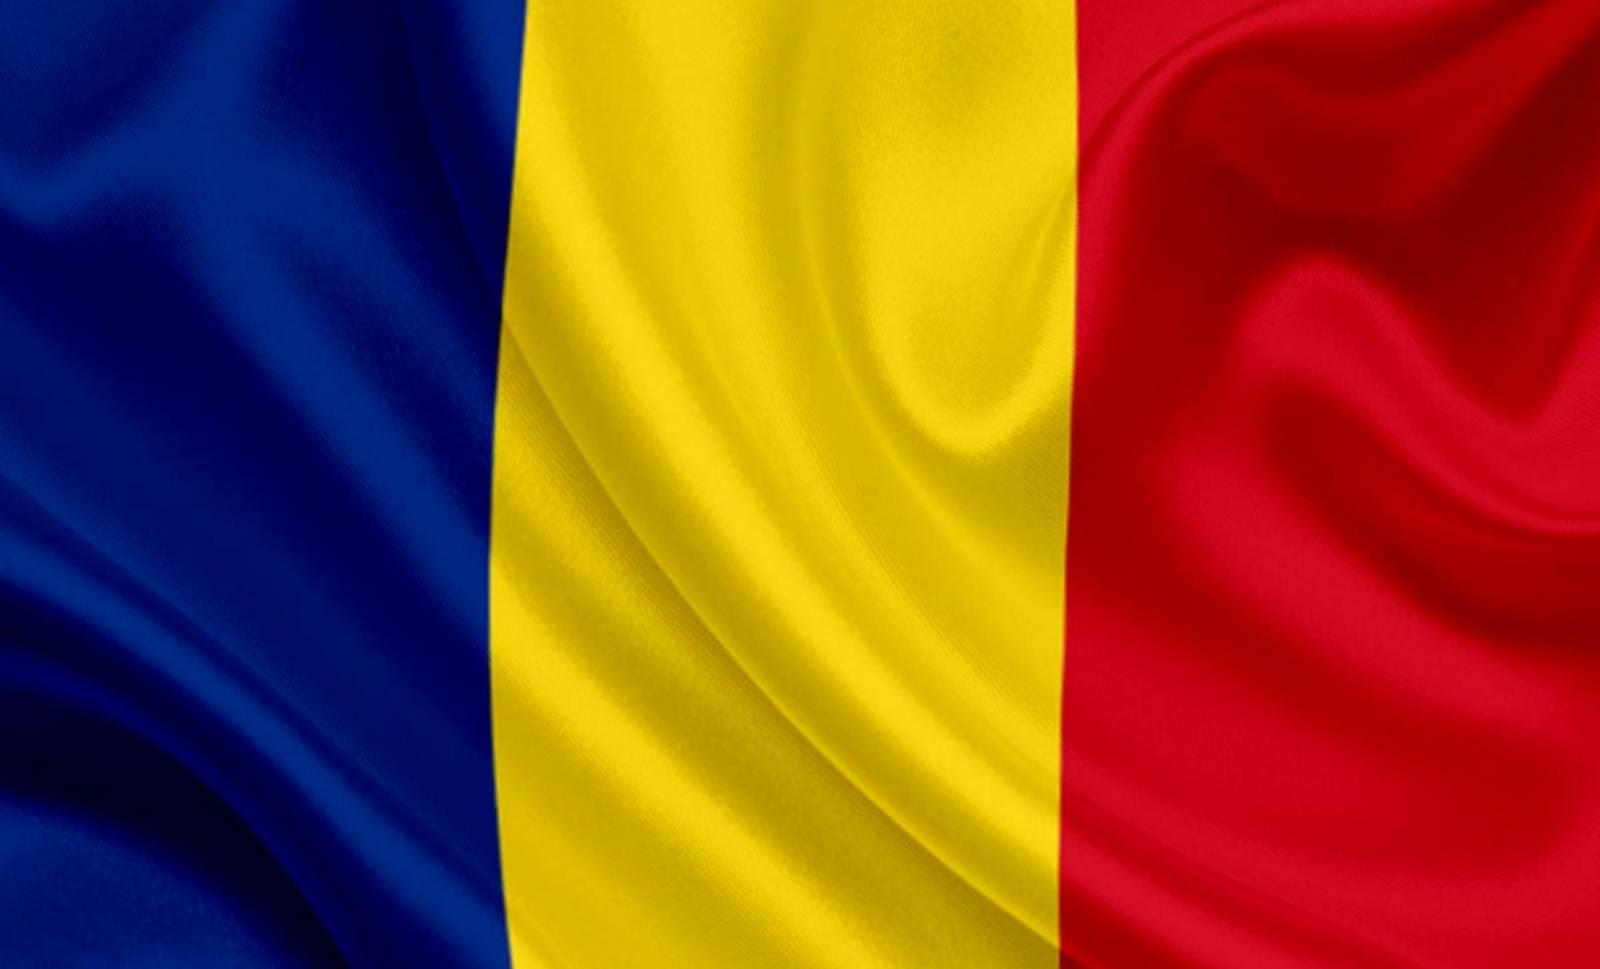 DSU 5 unitate mobila terapie intensiva Romania